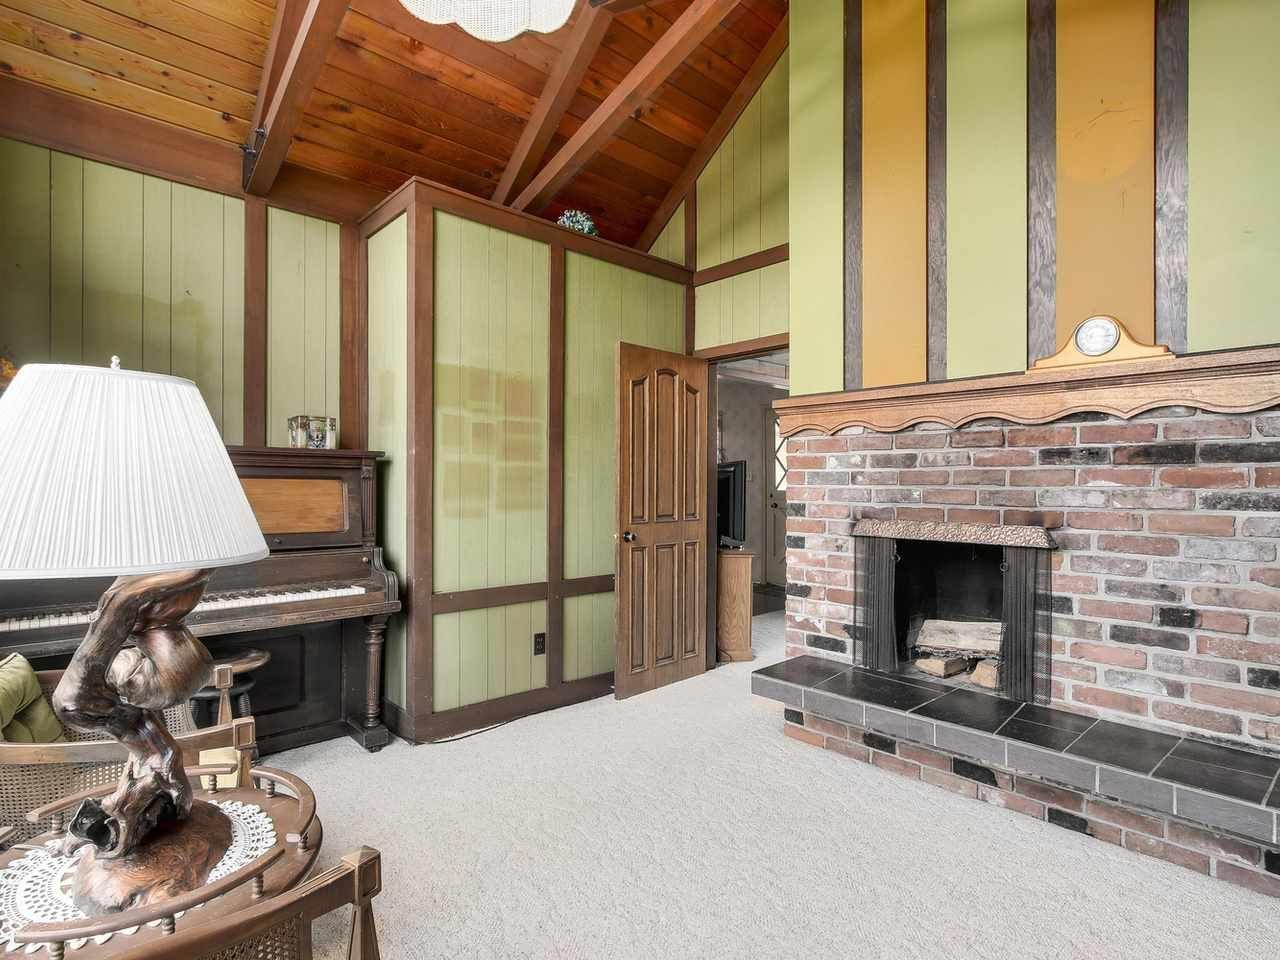 Photo 6: Photos: 1320 REGAN Avenue in Coquitlam: Central Coquitlam House for sale : MLS®# R2147096